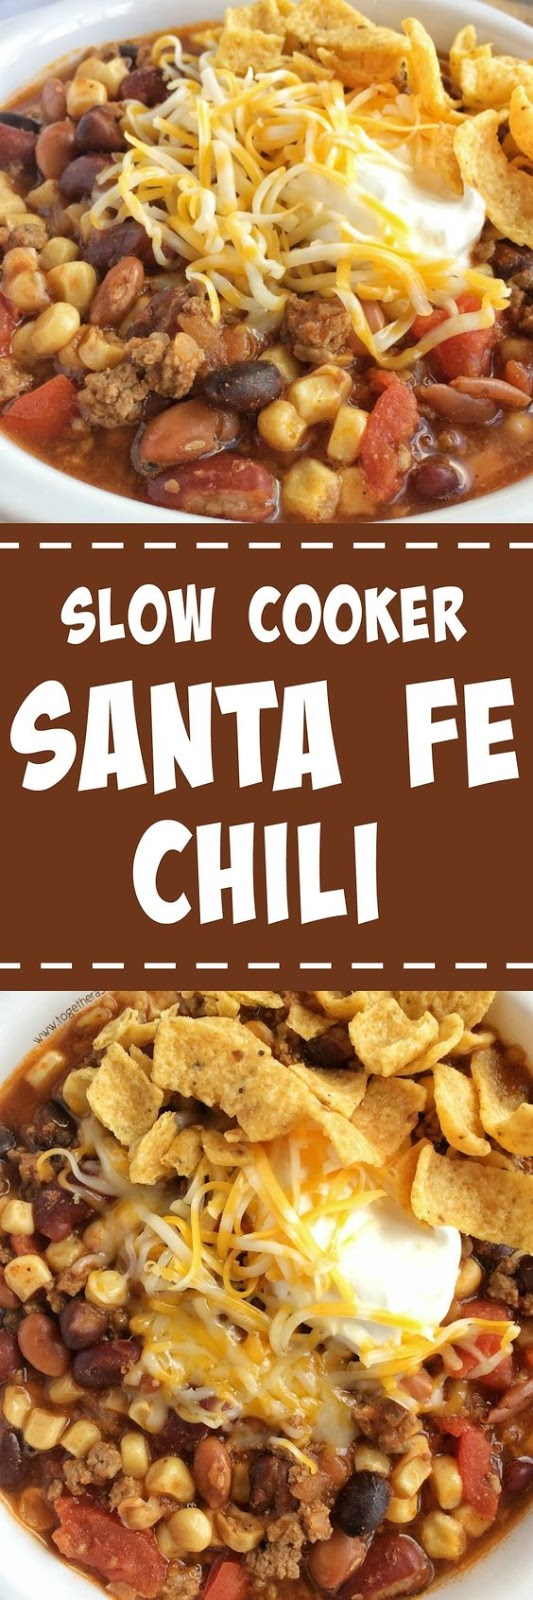 SLOW COOKER SANTA FE CHILI